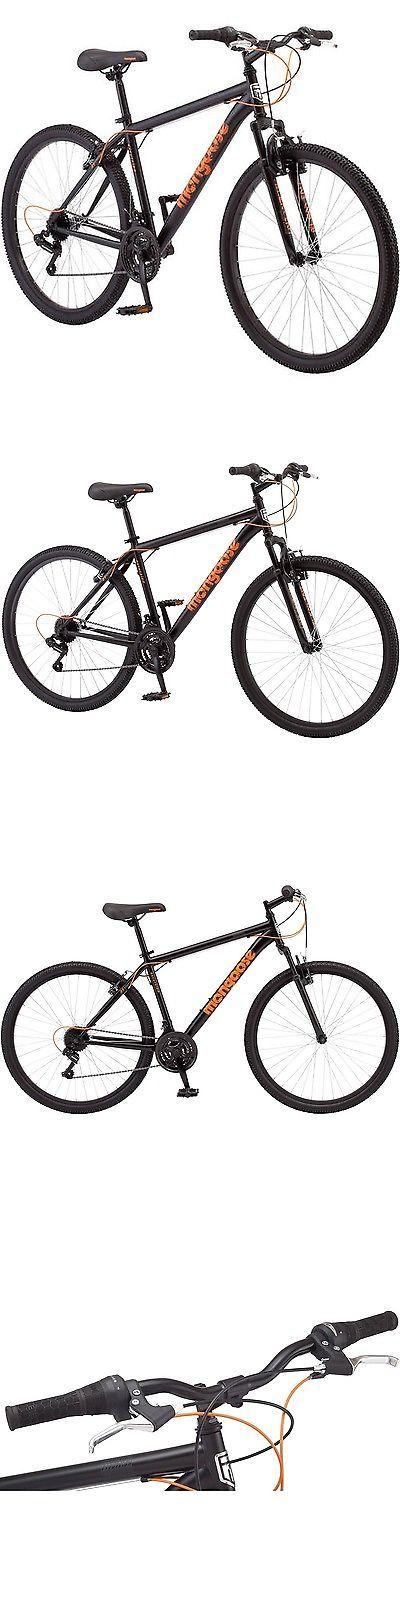 Bicycles 177831: 27.5 Mongoose Excursion Men S Mountain Bike Black Neon Orange -> BUY IT NOW ONLY: $144.25 on eBay!